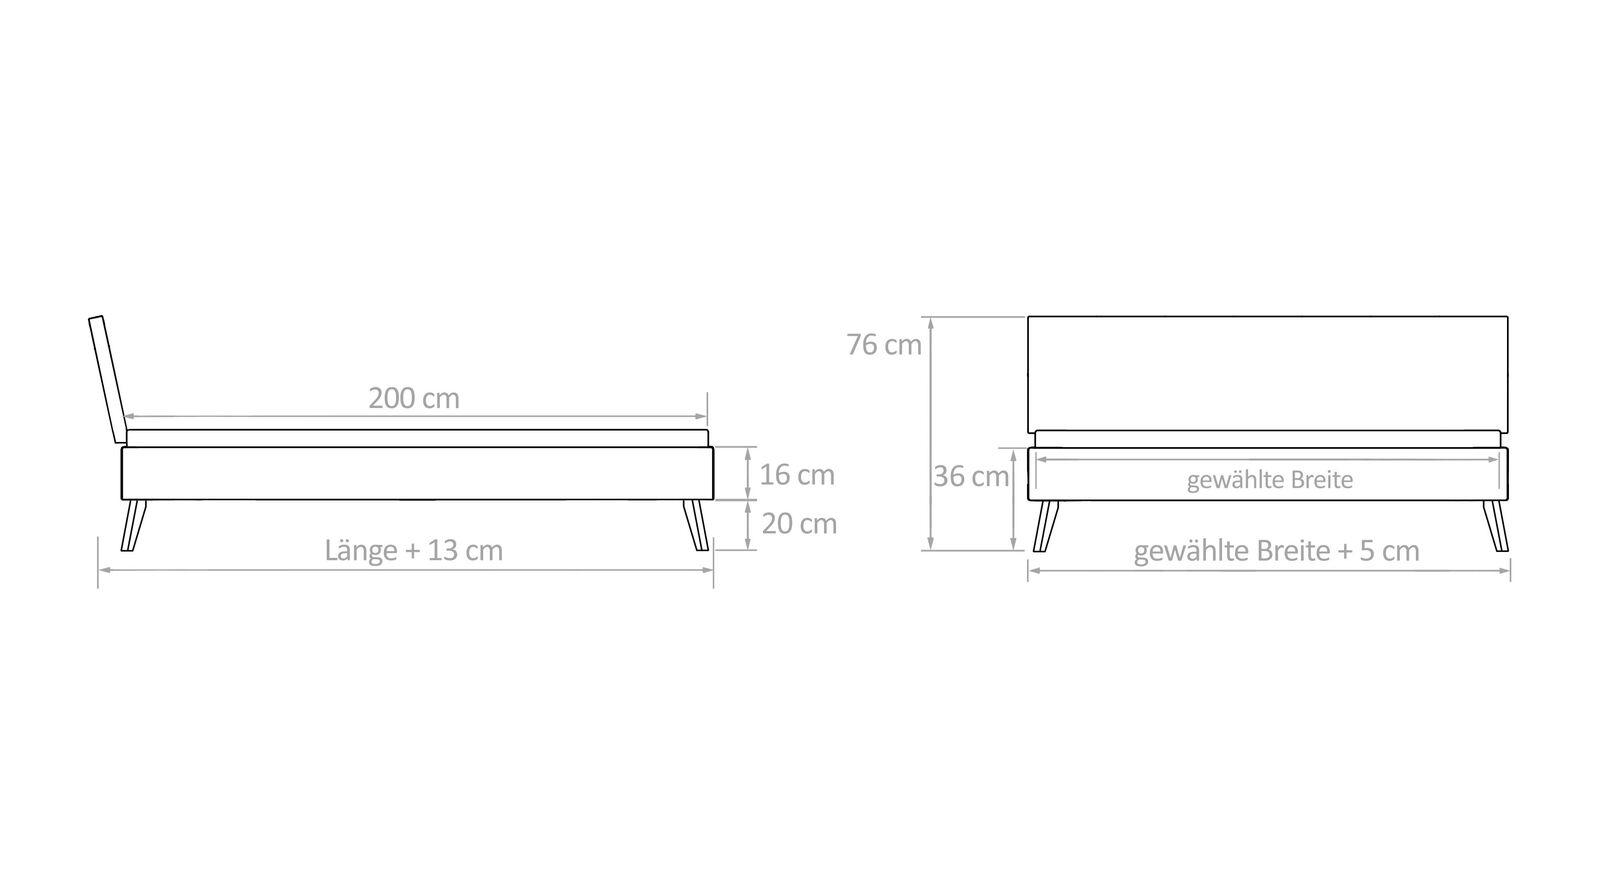 Maß-Grafik zum Bett Coraia